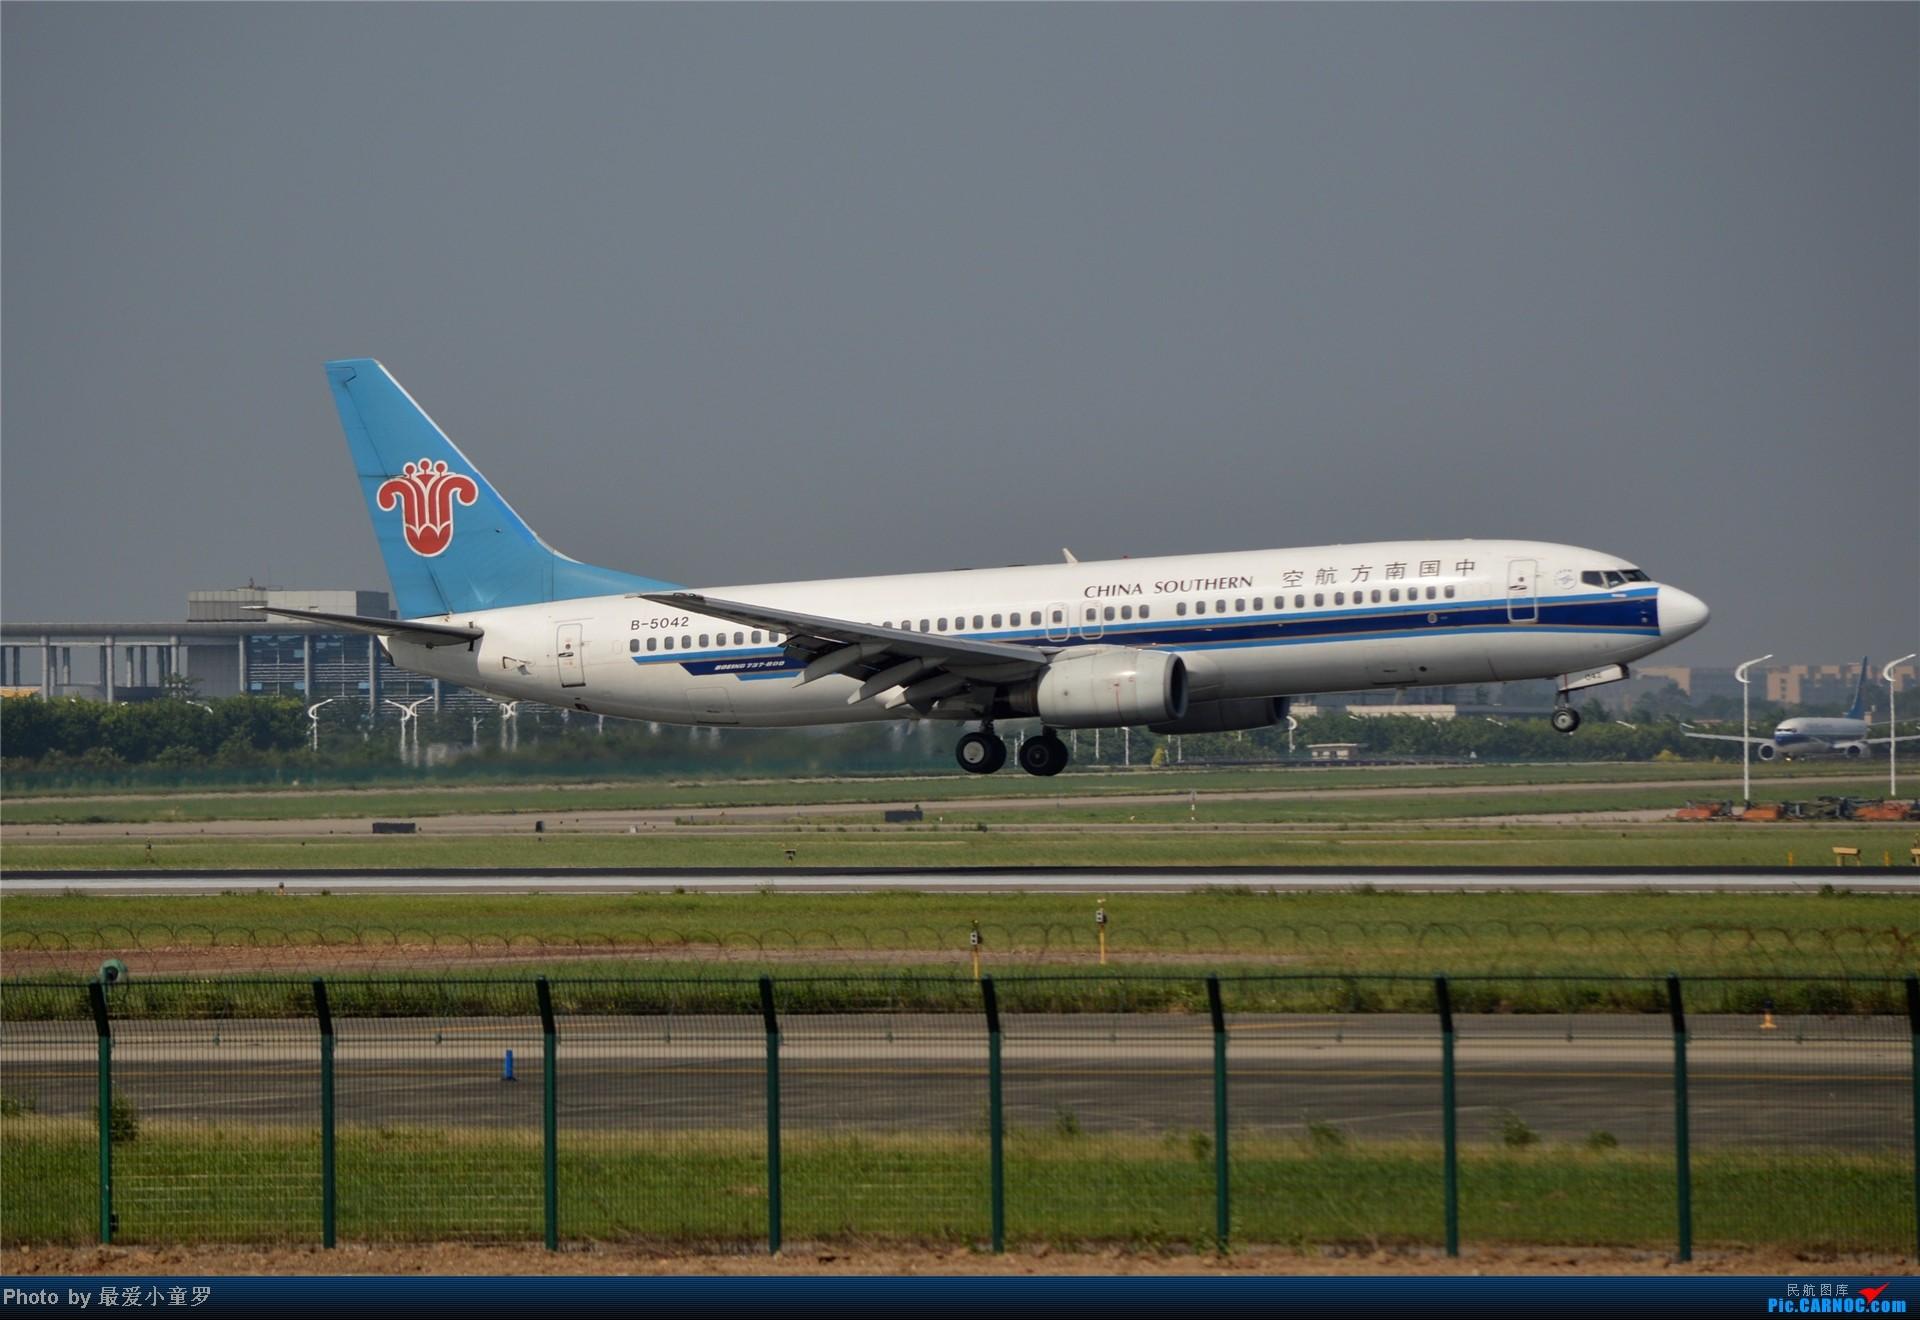 Re:[原创]炒冷饭贴之13年10月2日CAN拍机杂图系列 BOEING 737-800 B-5042 中国广州白云机场